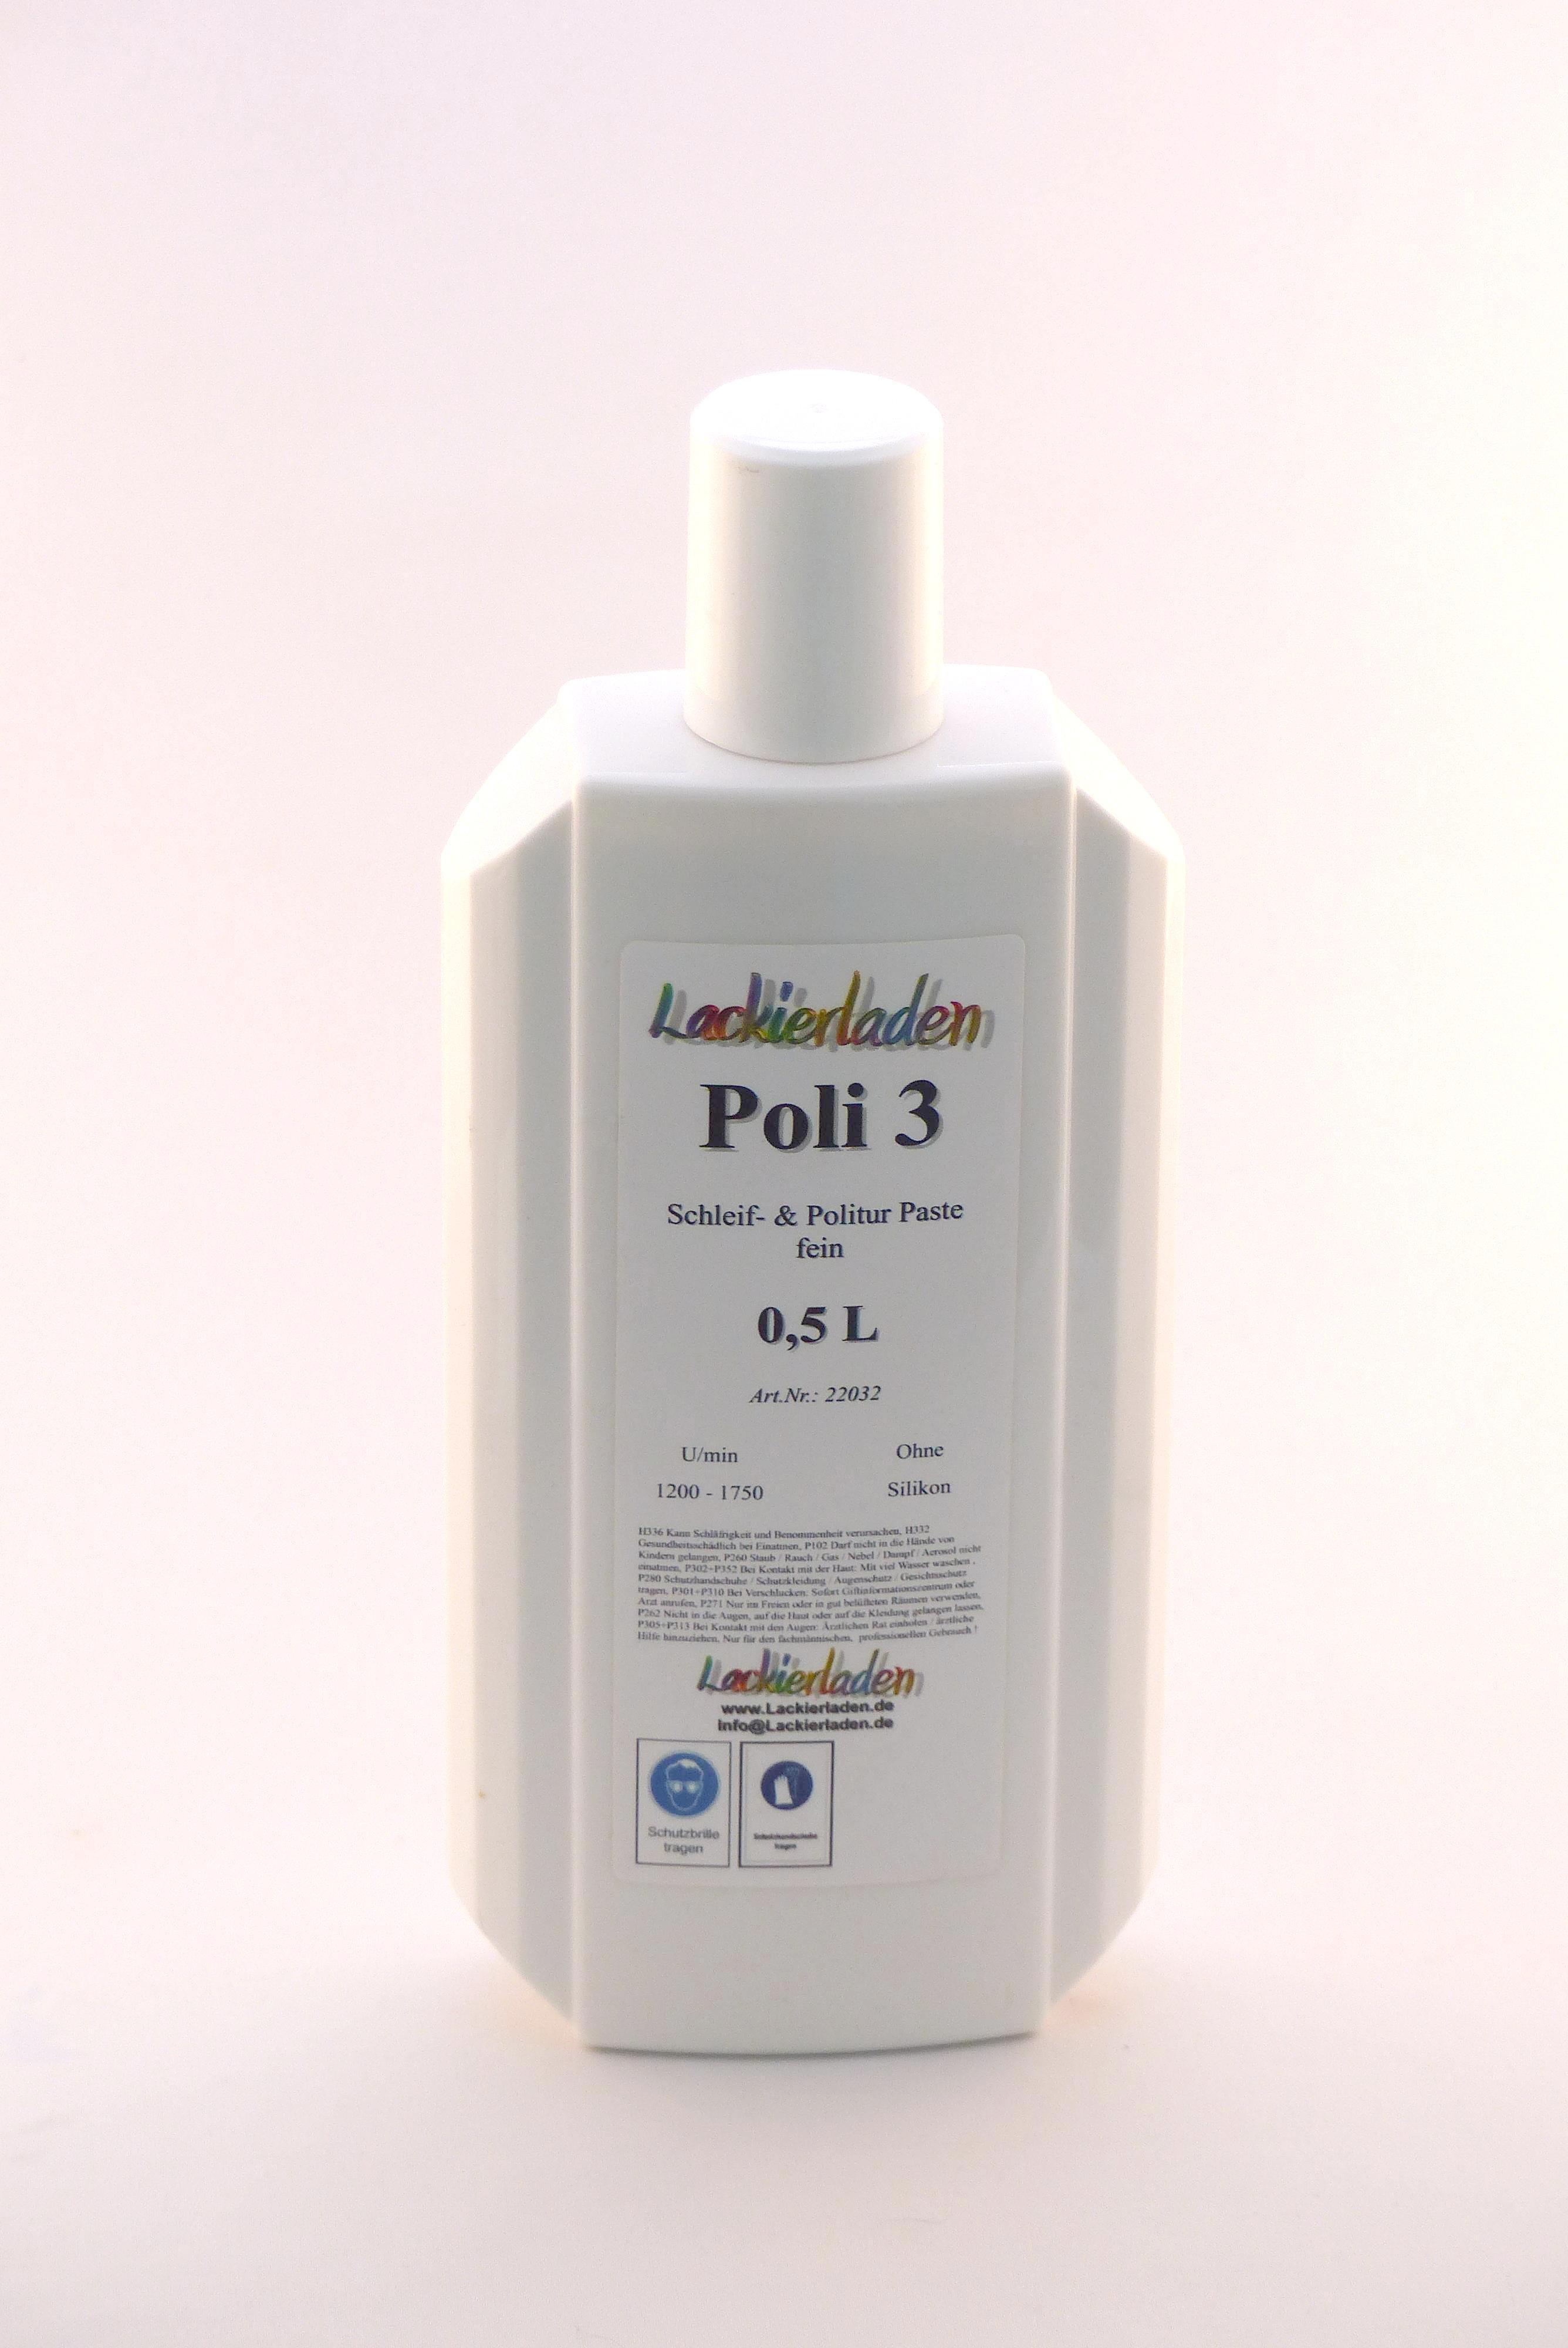 Poli 3 Schleif- & Politur Paste fein 0,5 L